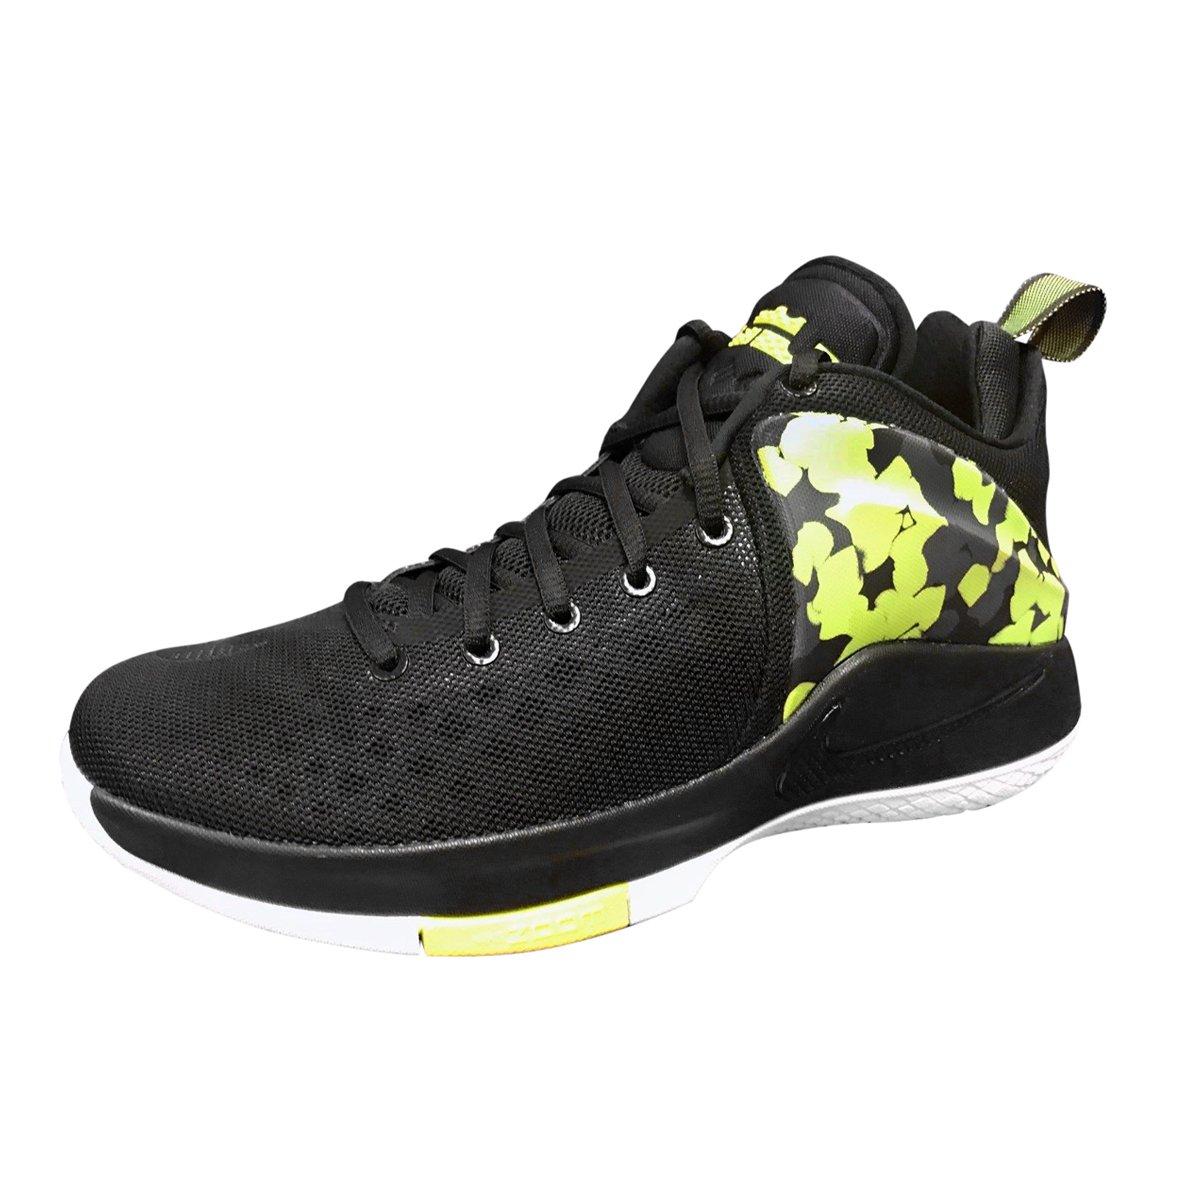 detailing ba7b4 740a7 Amazon.com   Nike Mens Zoom Witness Lebron Sneakers New, Black Volt  852439-017 (12)   Fashion Sneakers